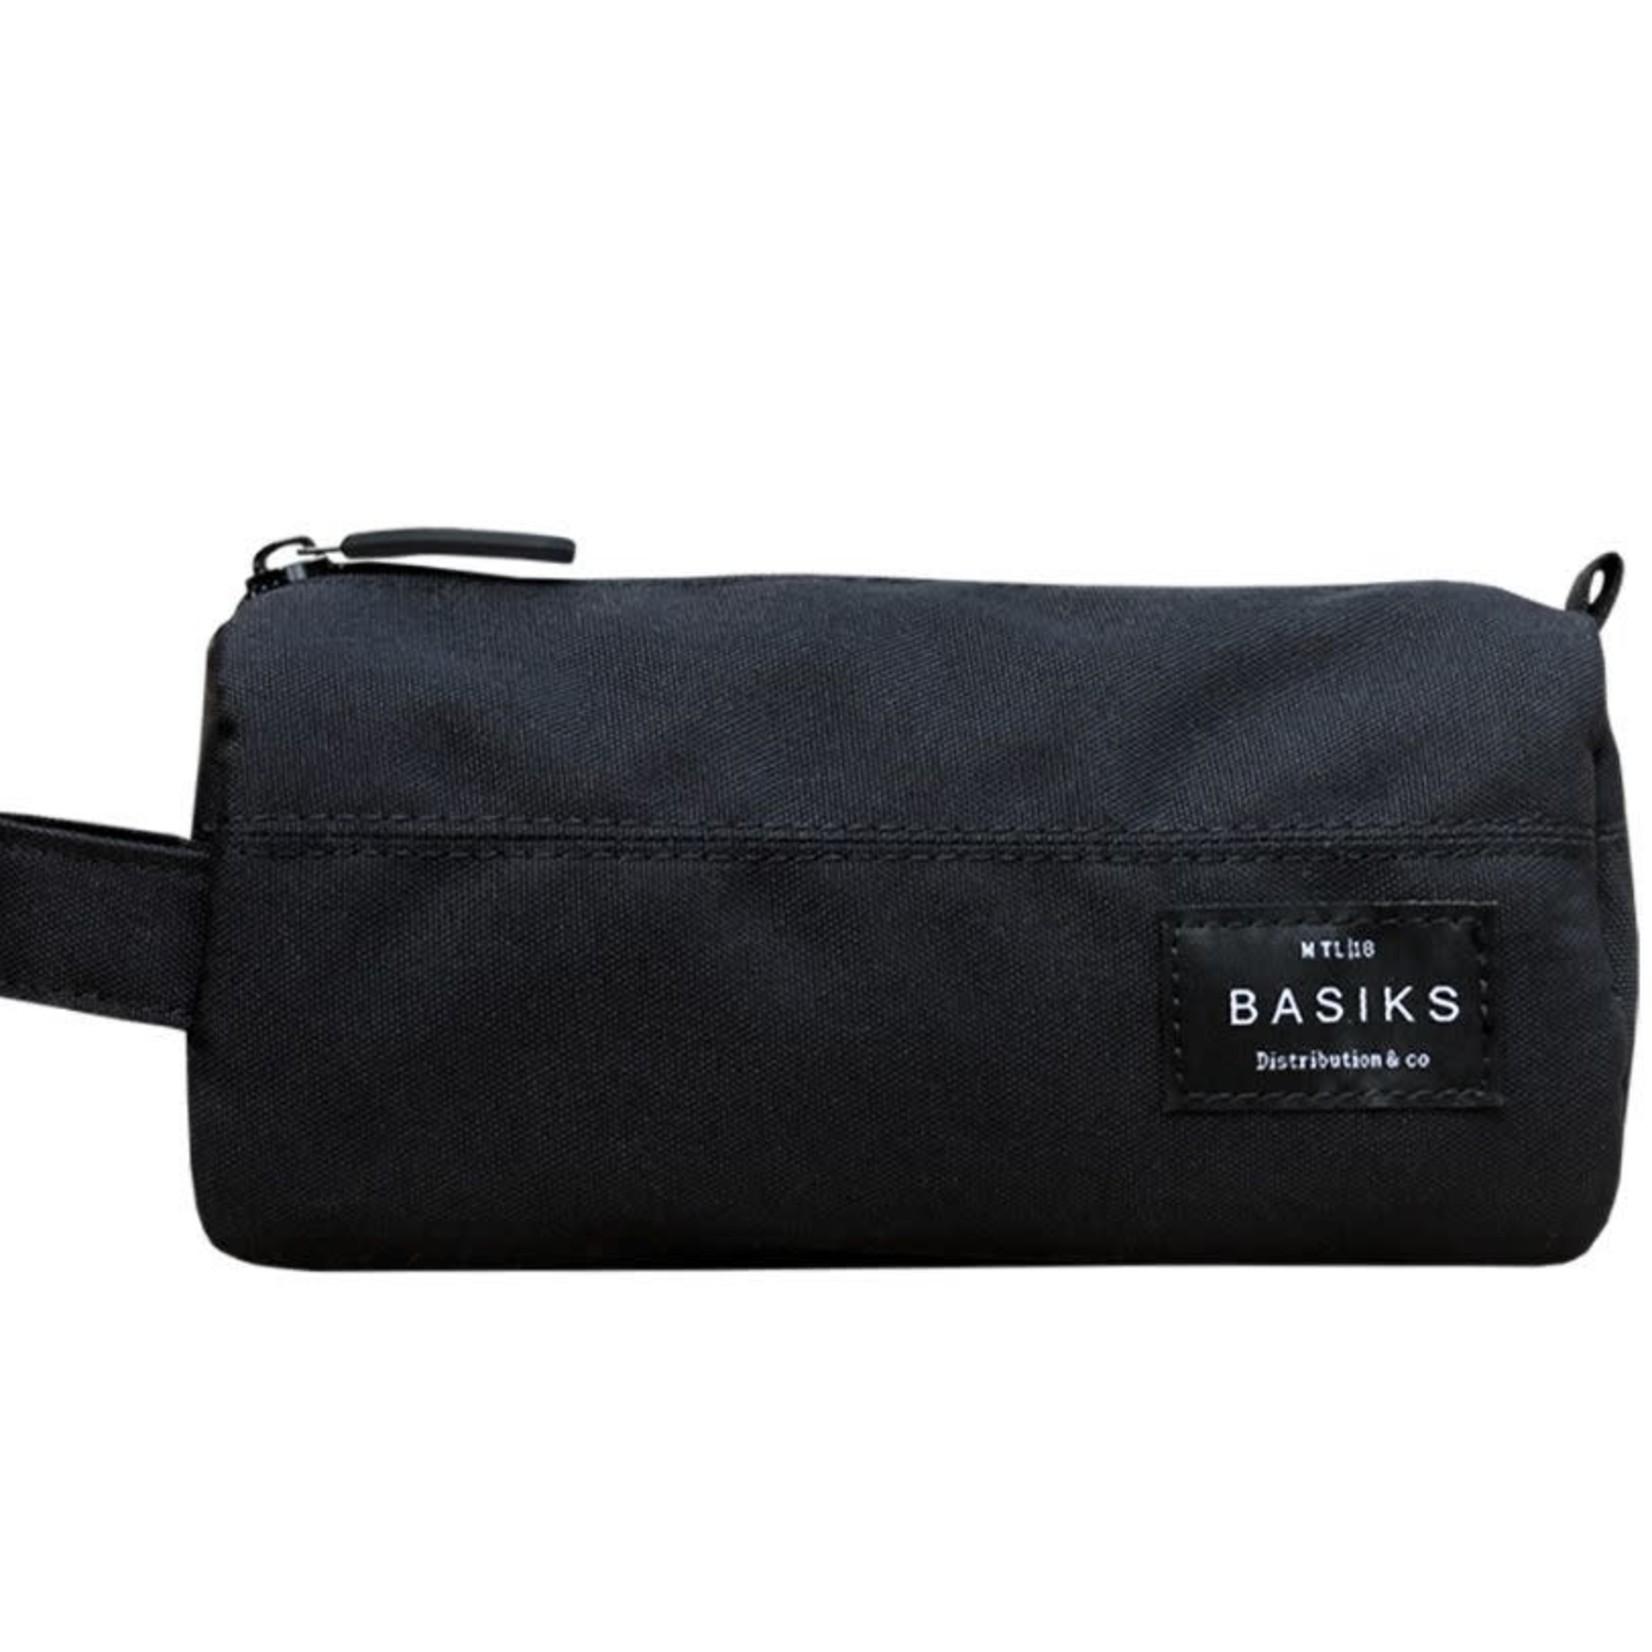 Basiks.Co Basiks.Co : Eternal Case, Black,O/S